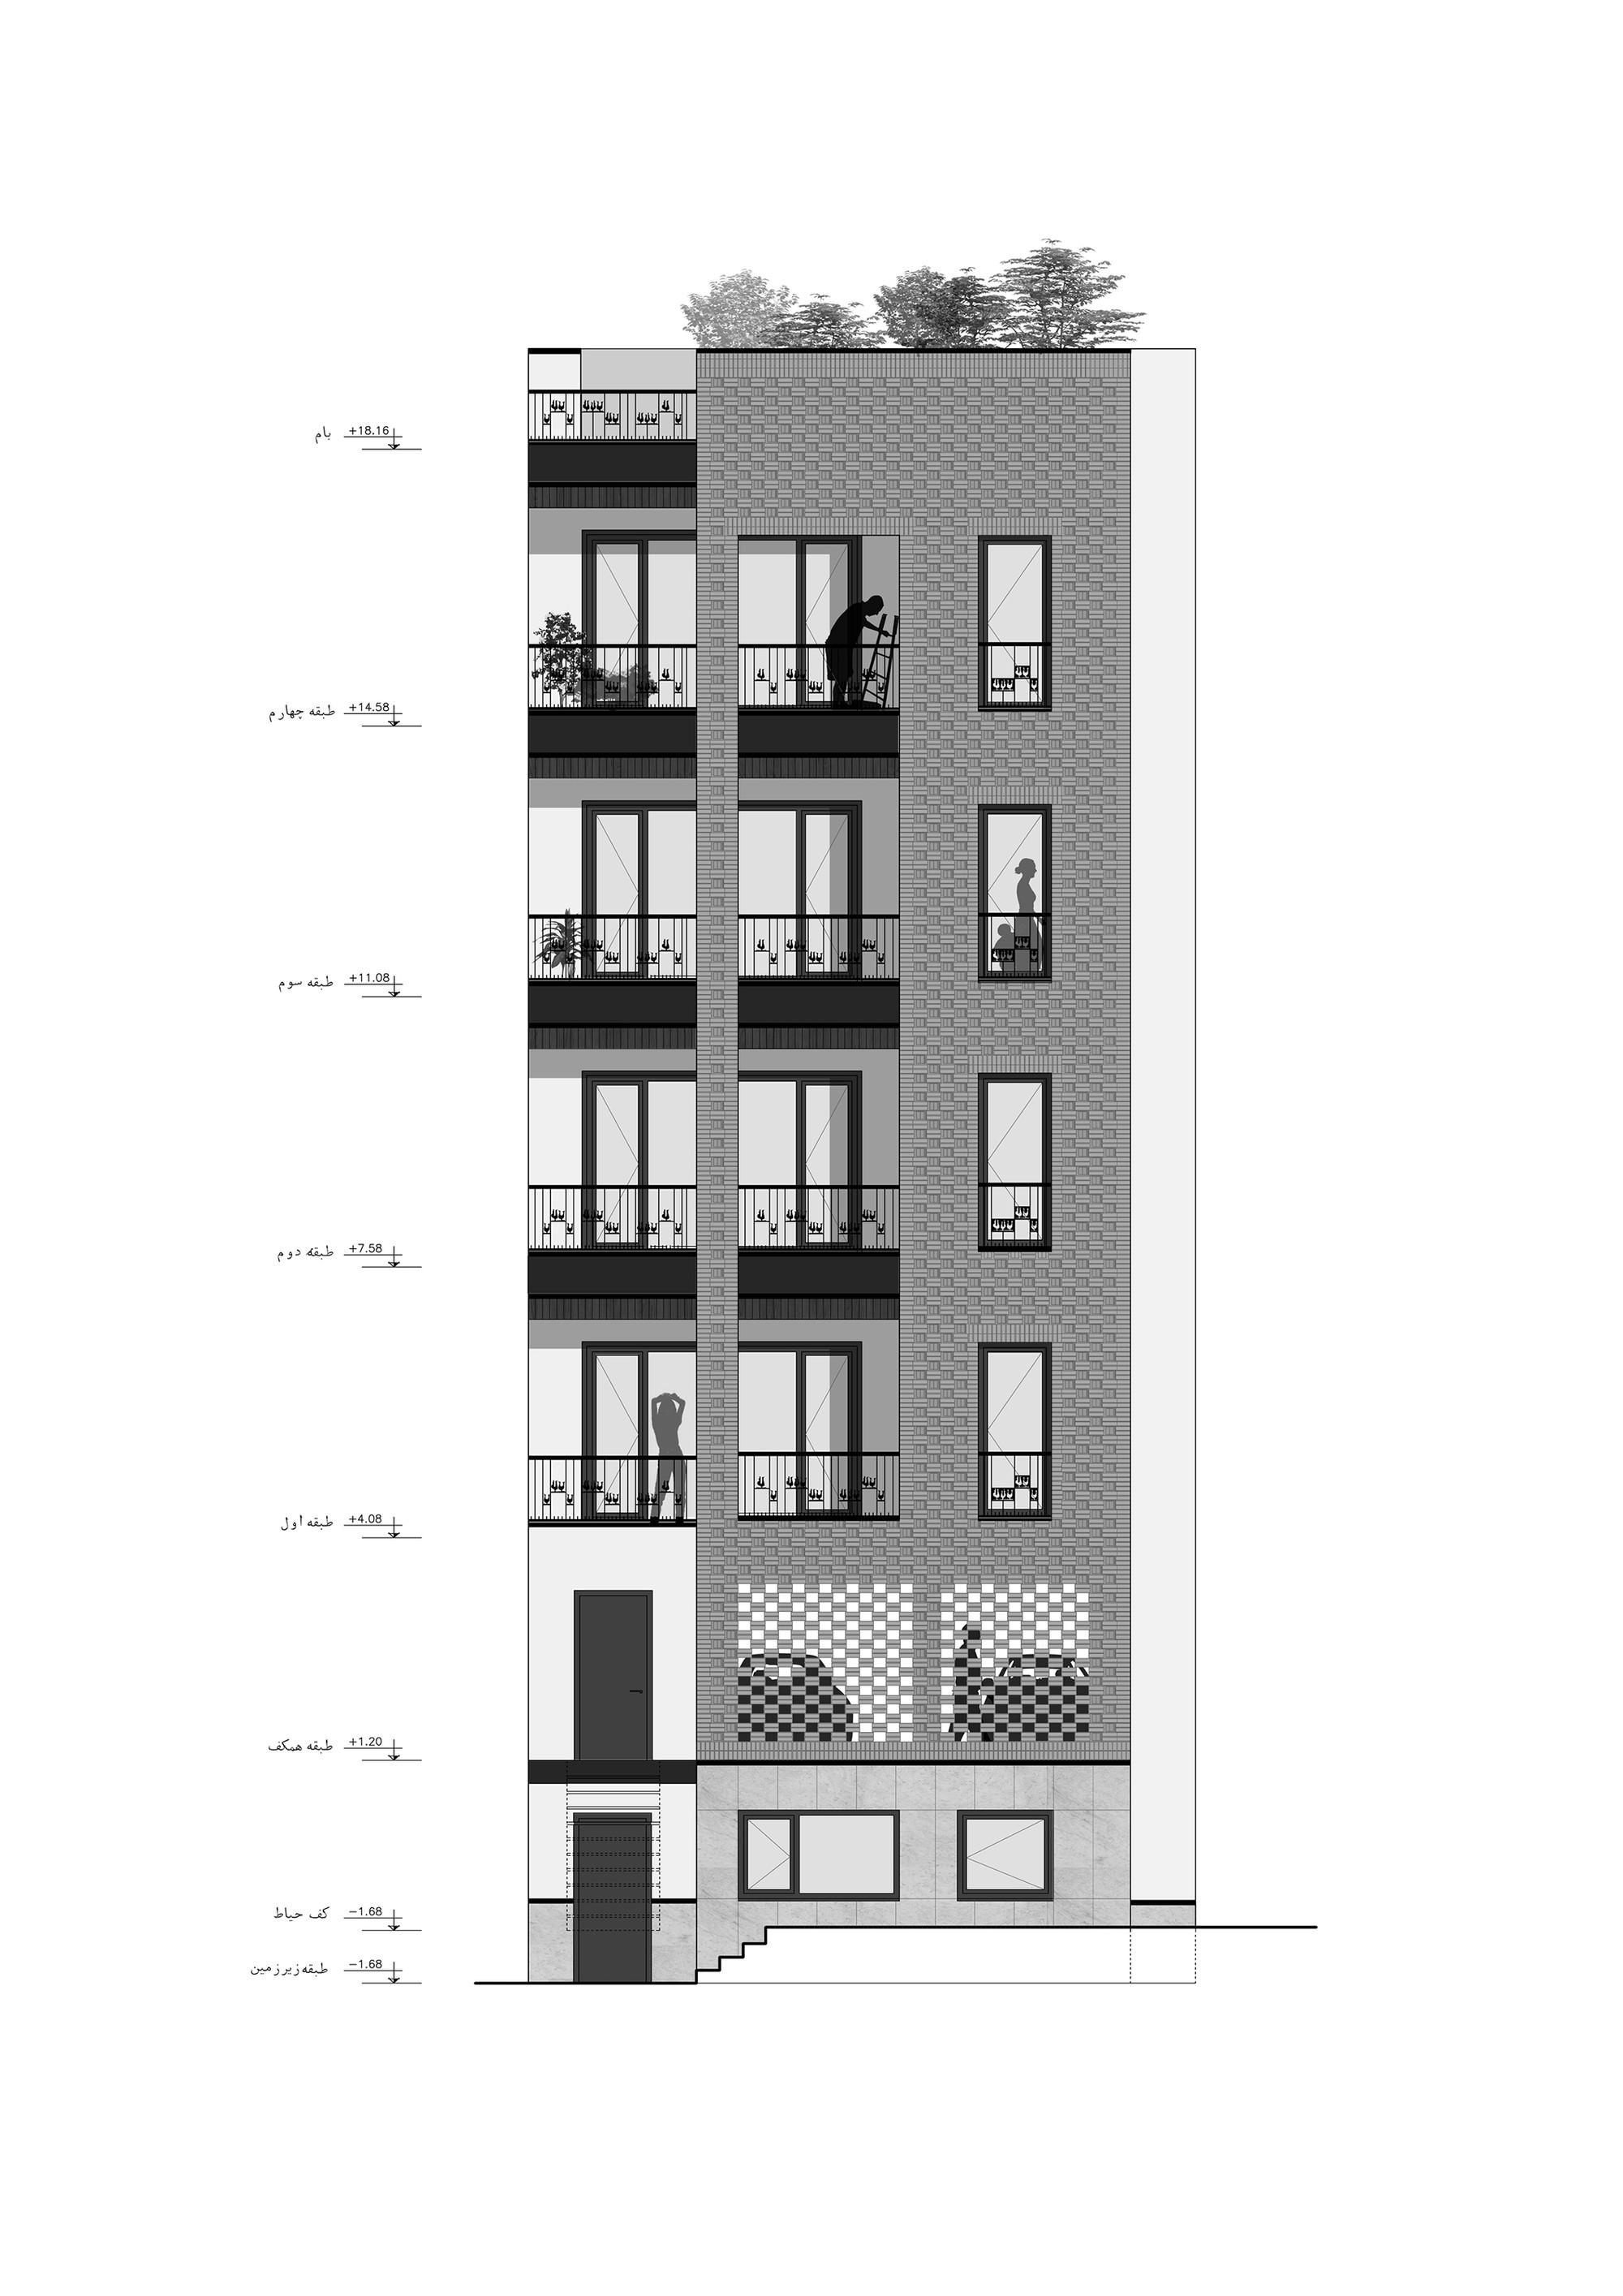 Gallery of Haghighi Residential Building Boozhgan Architec